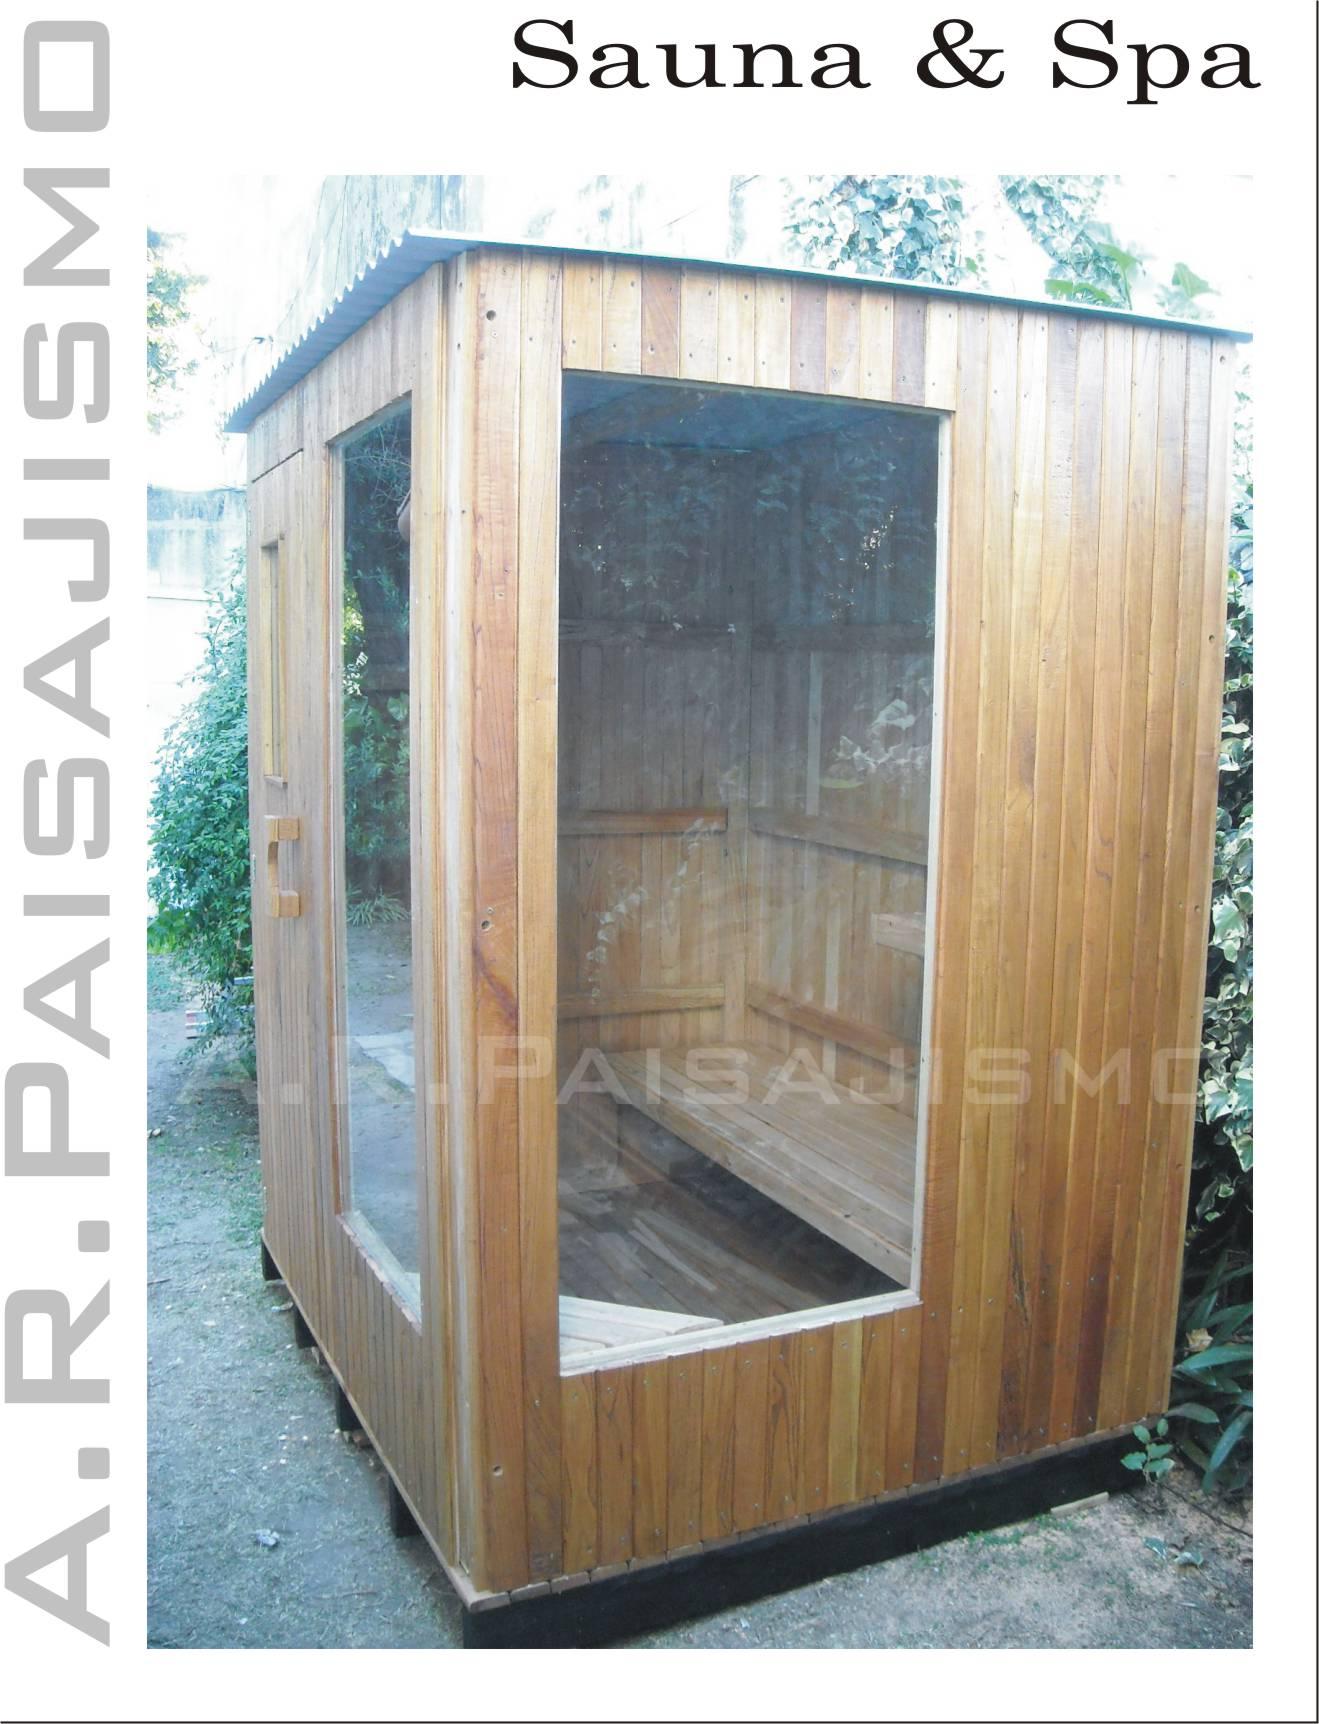 Ba o sauna seco madera artesanal para intemperie o interno - Construir una sauna ...